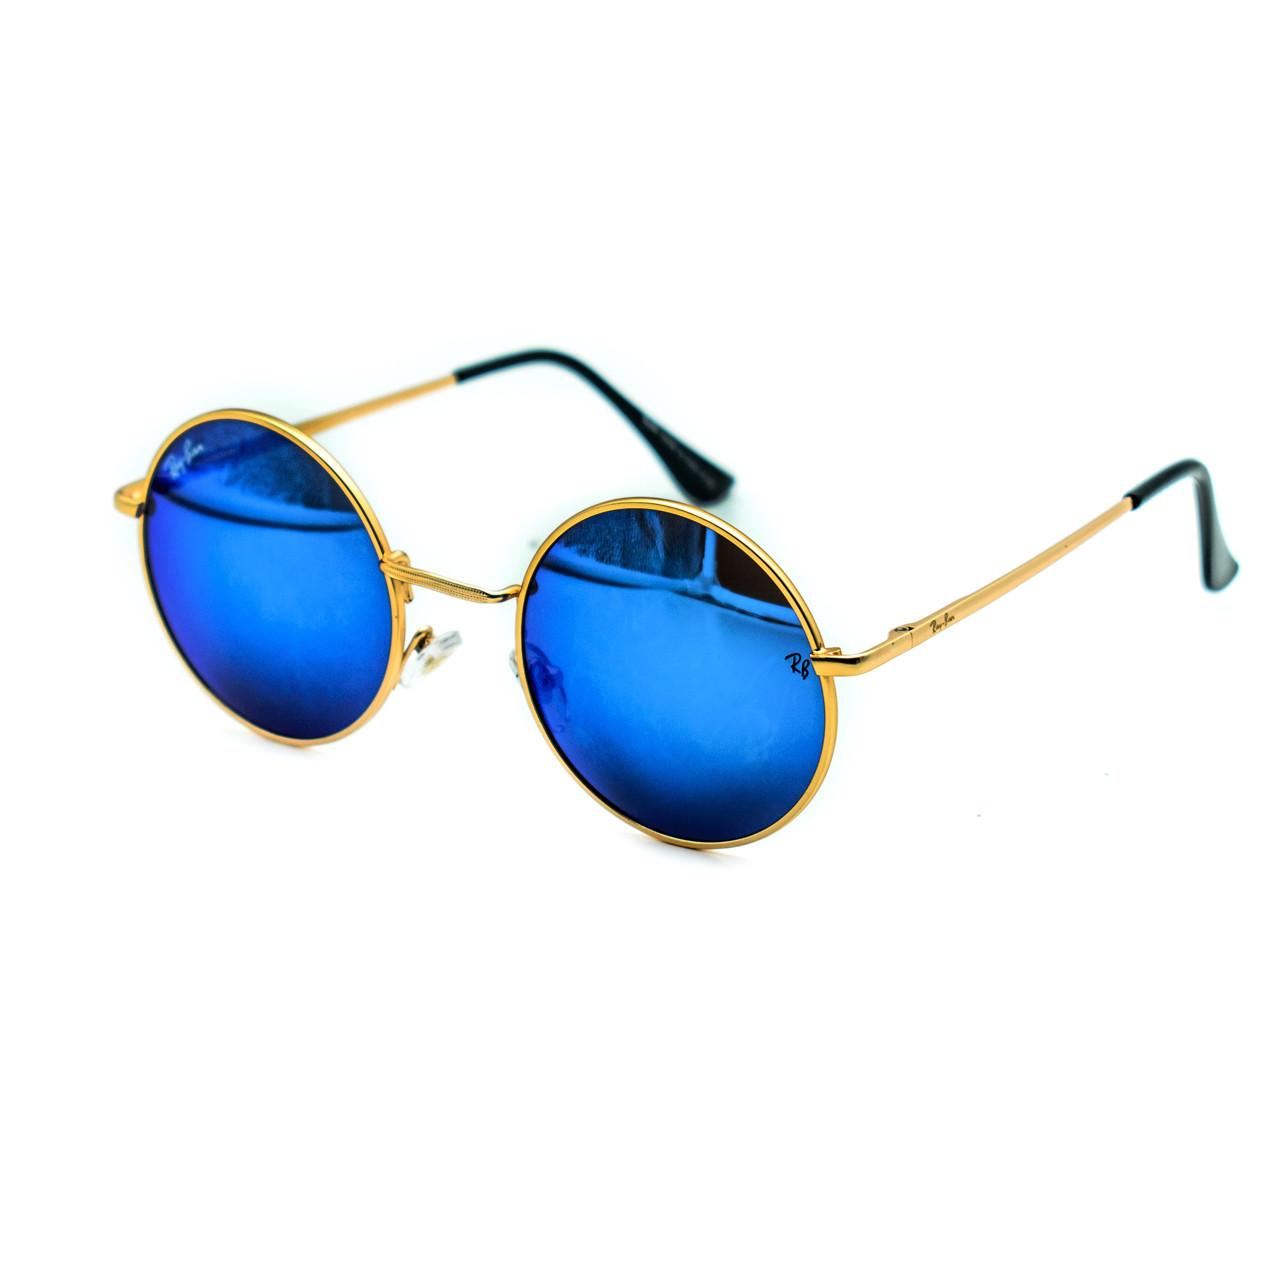 Очки Ray Ban Roud blue (replica)